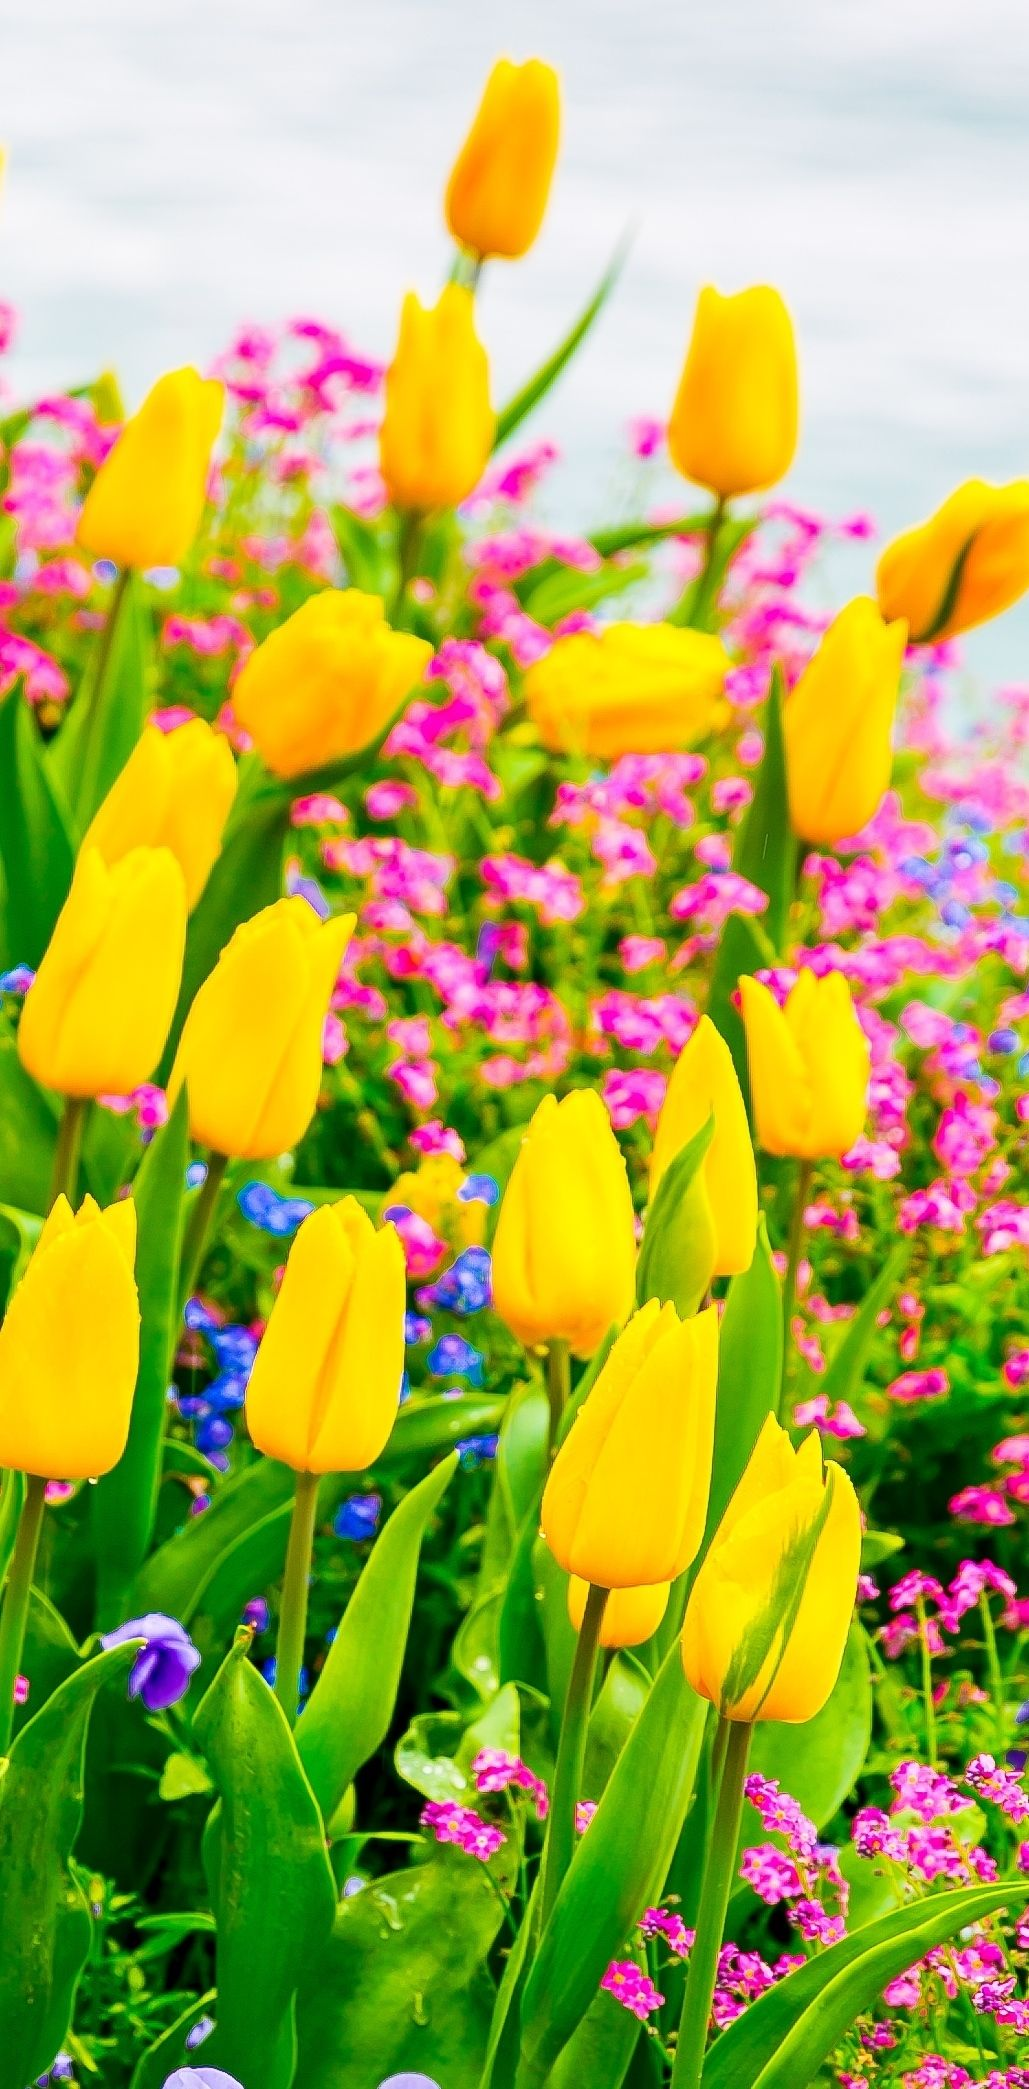 0d2bf48f20b963ac2084a2c4b5384540 Luxe De Fleurs De Jardin Des Idées